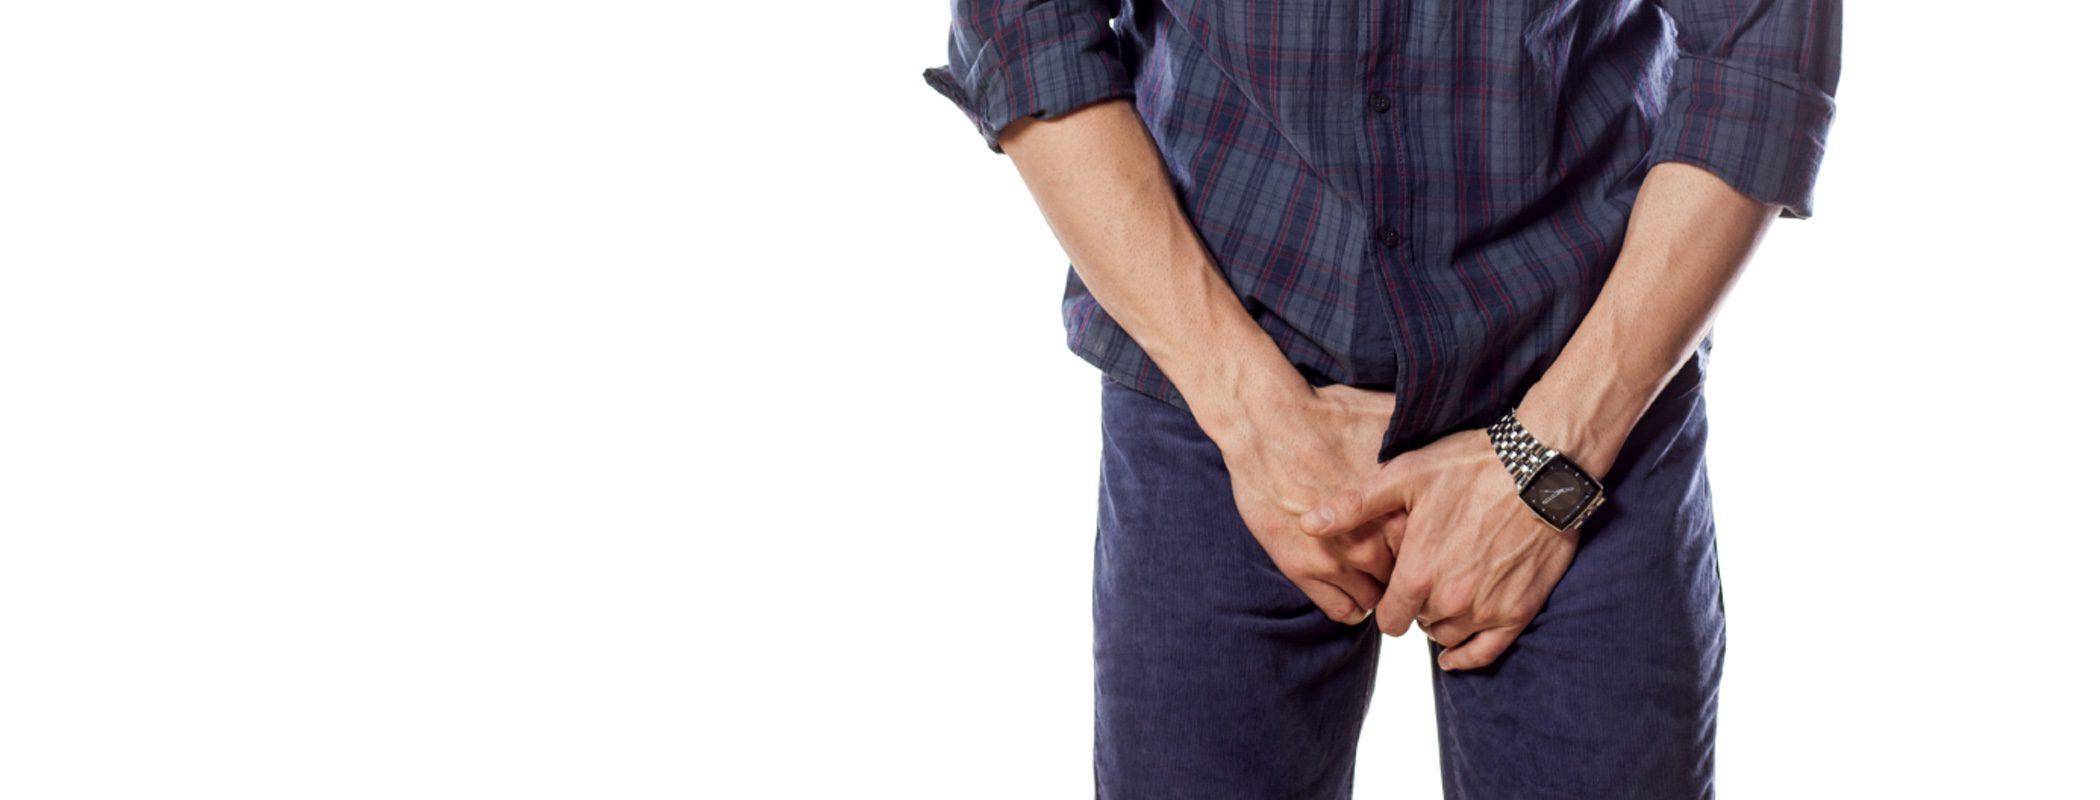 ¿Qué es la leucoplasia de pene?